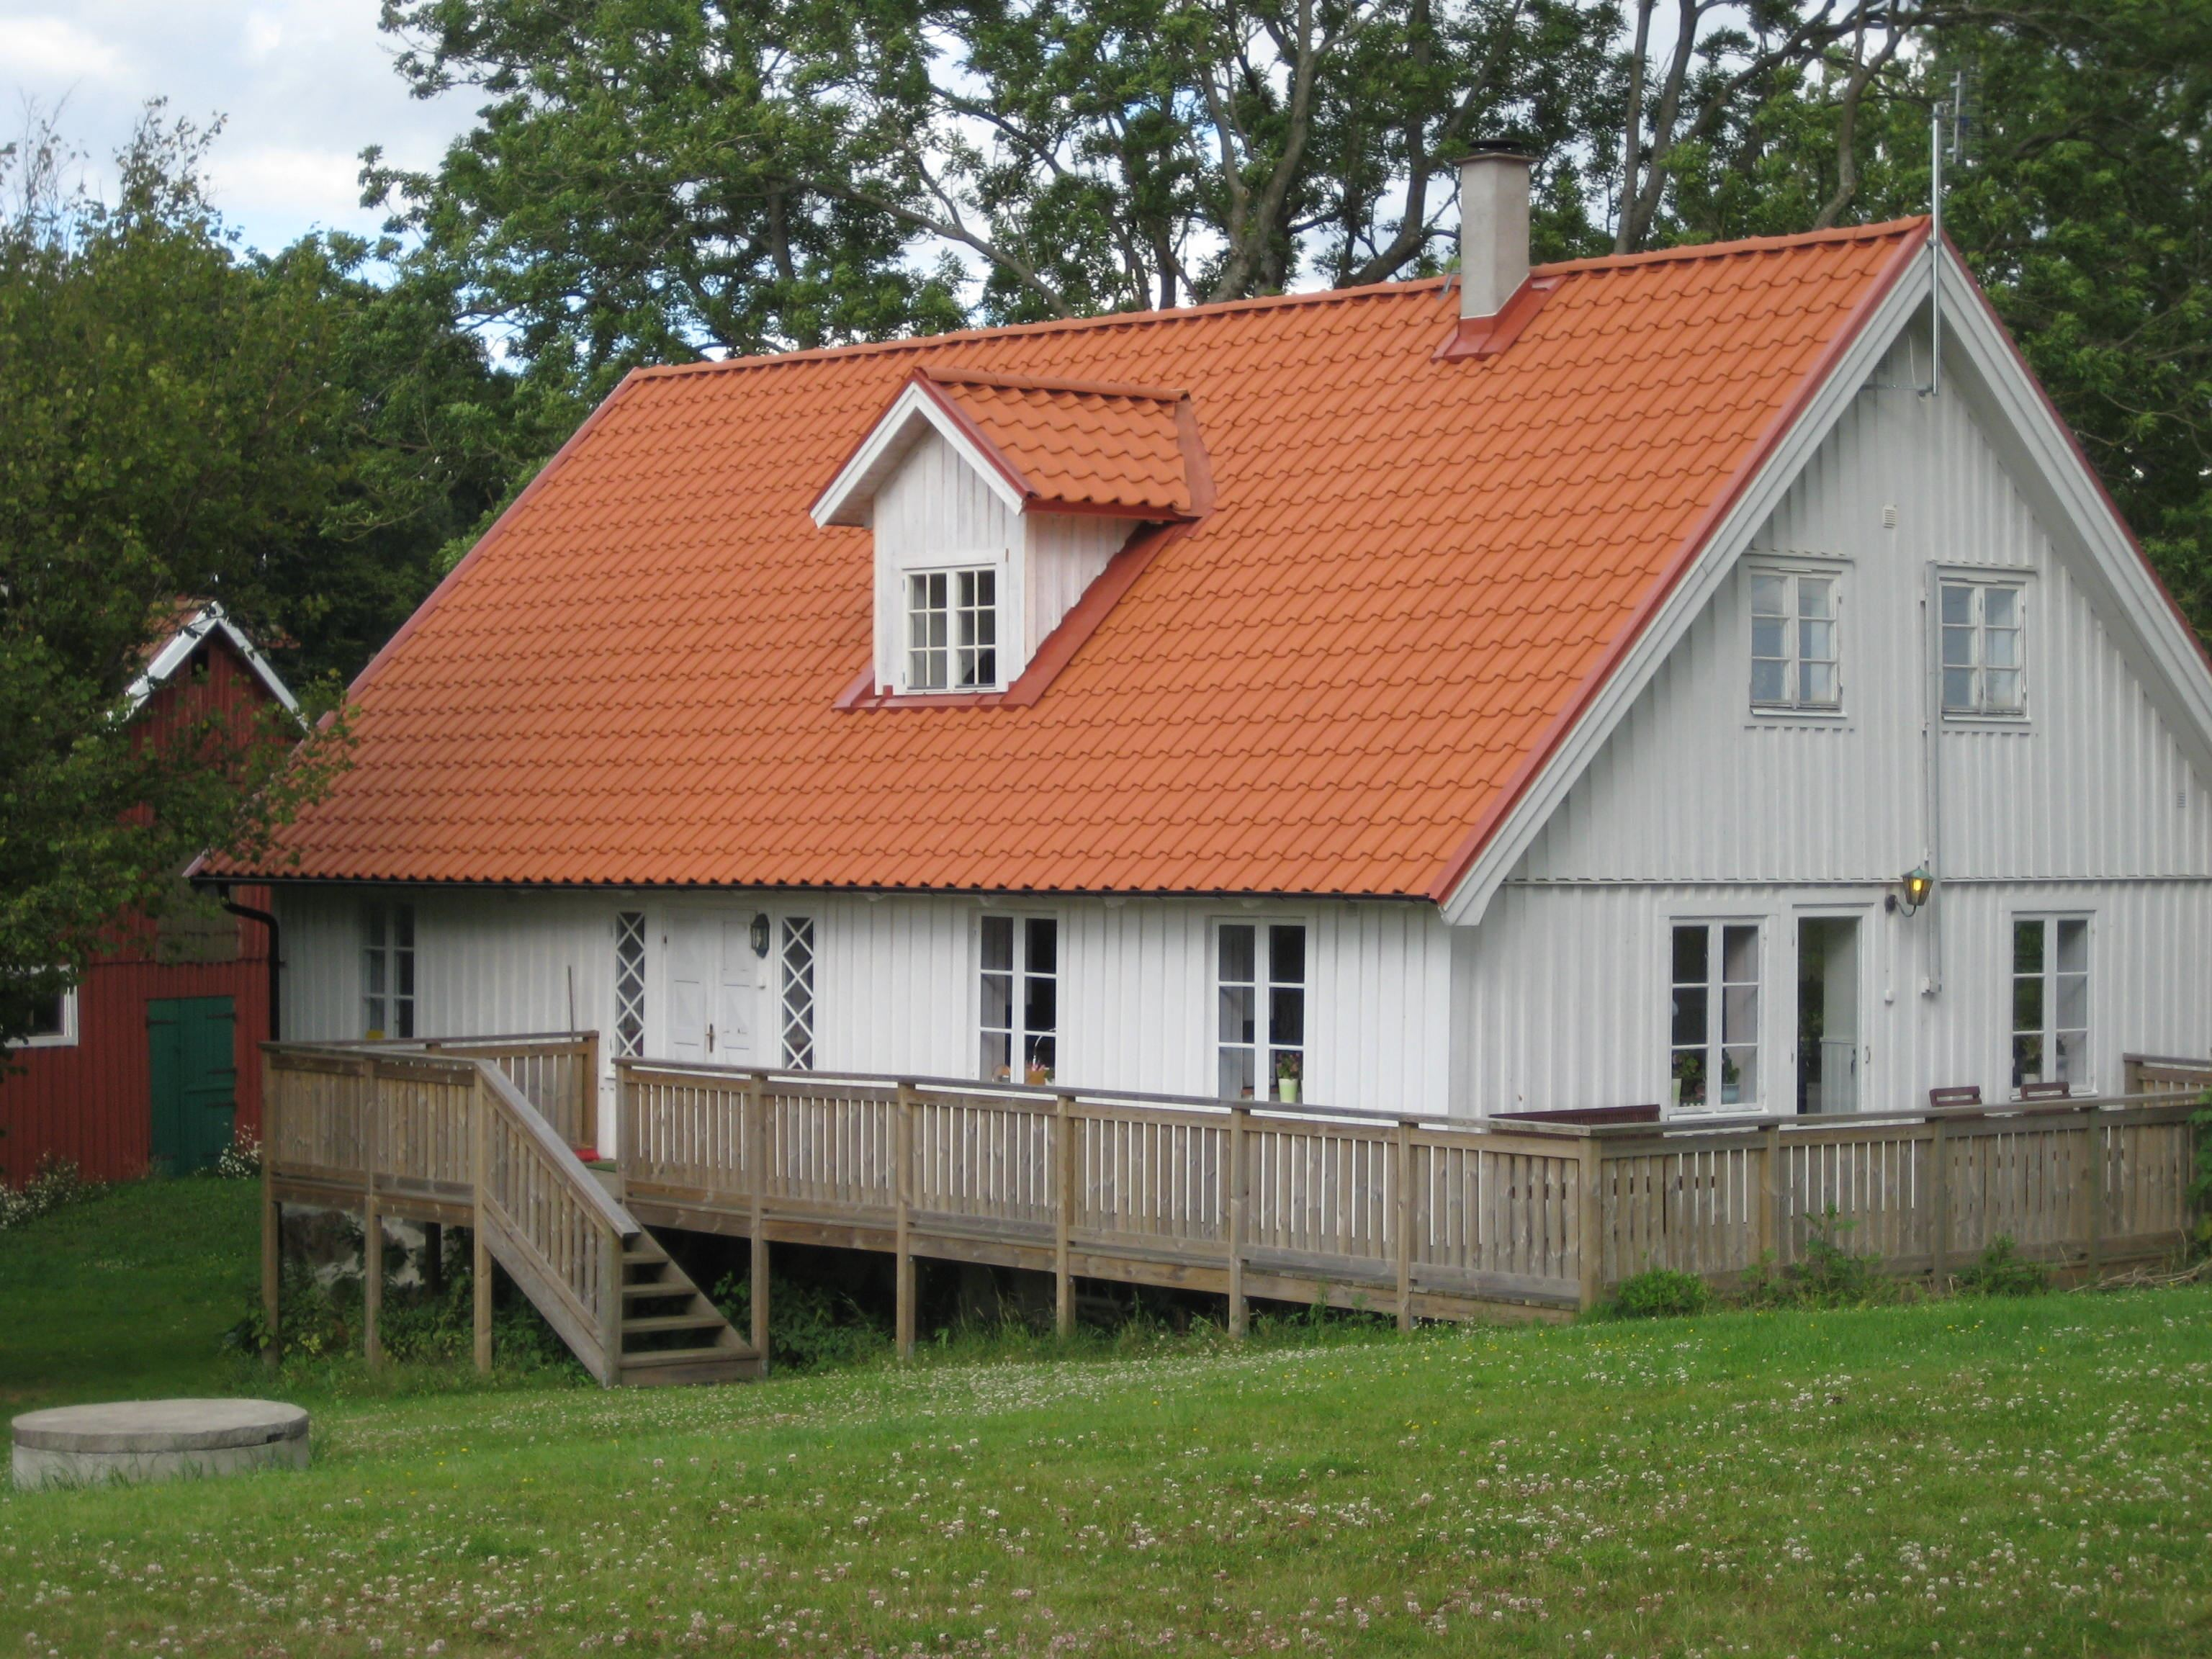 Bonnarps Hjortgård Tomtebo